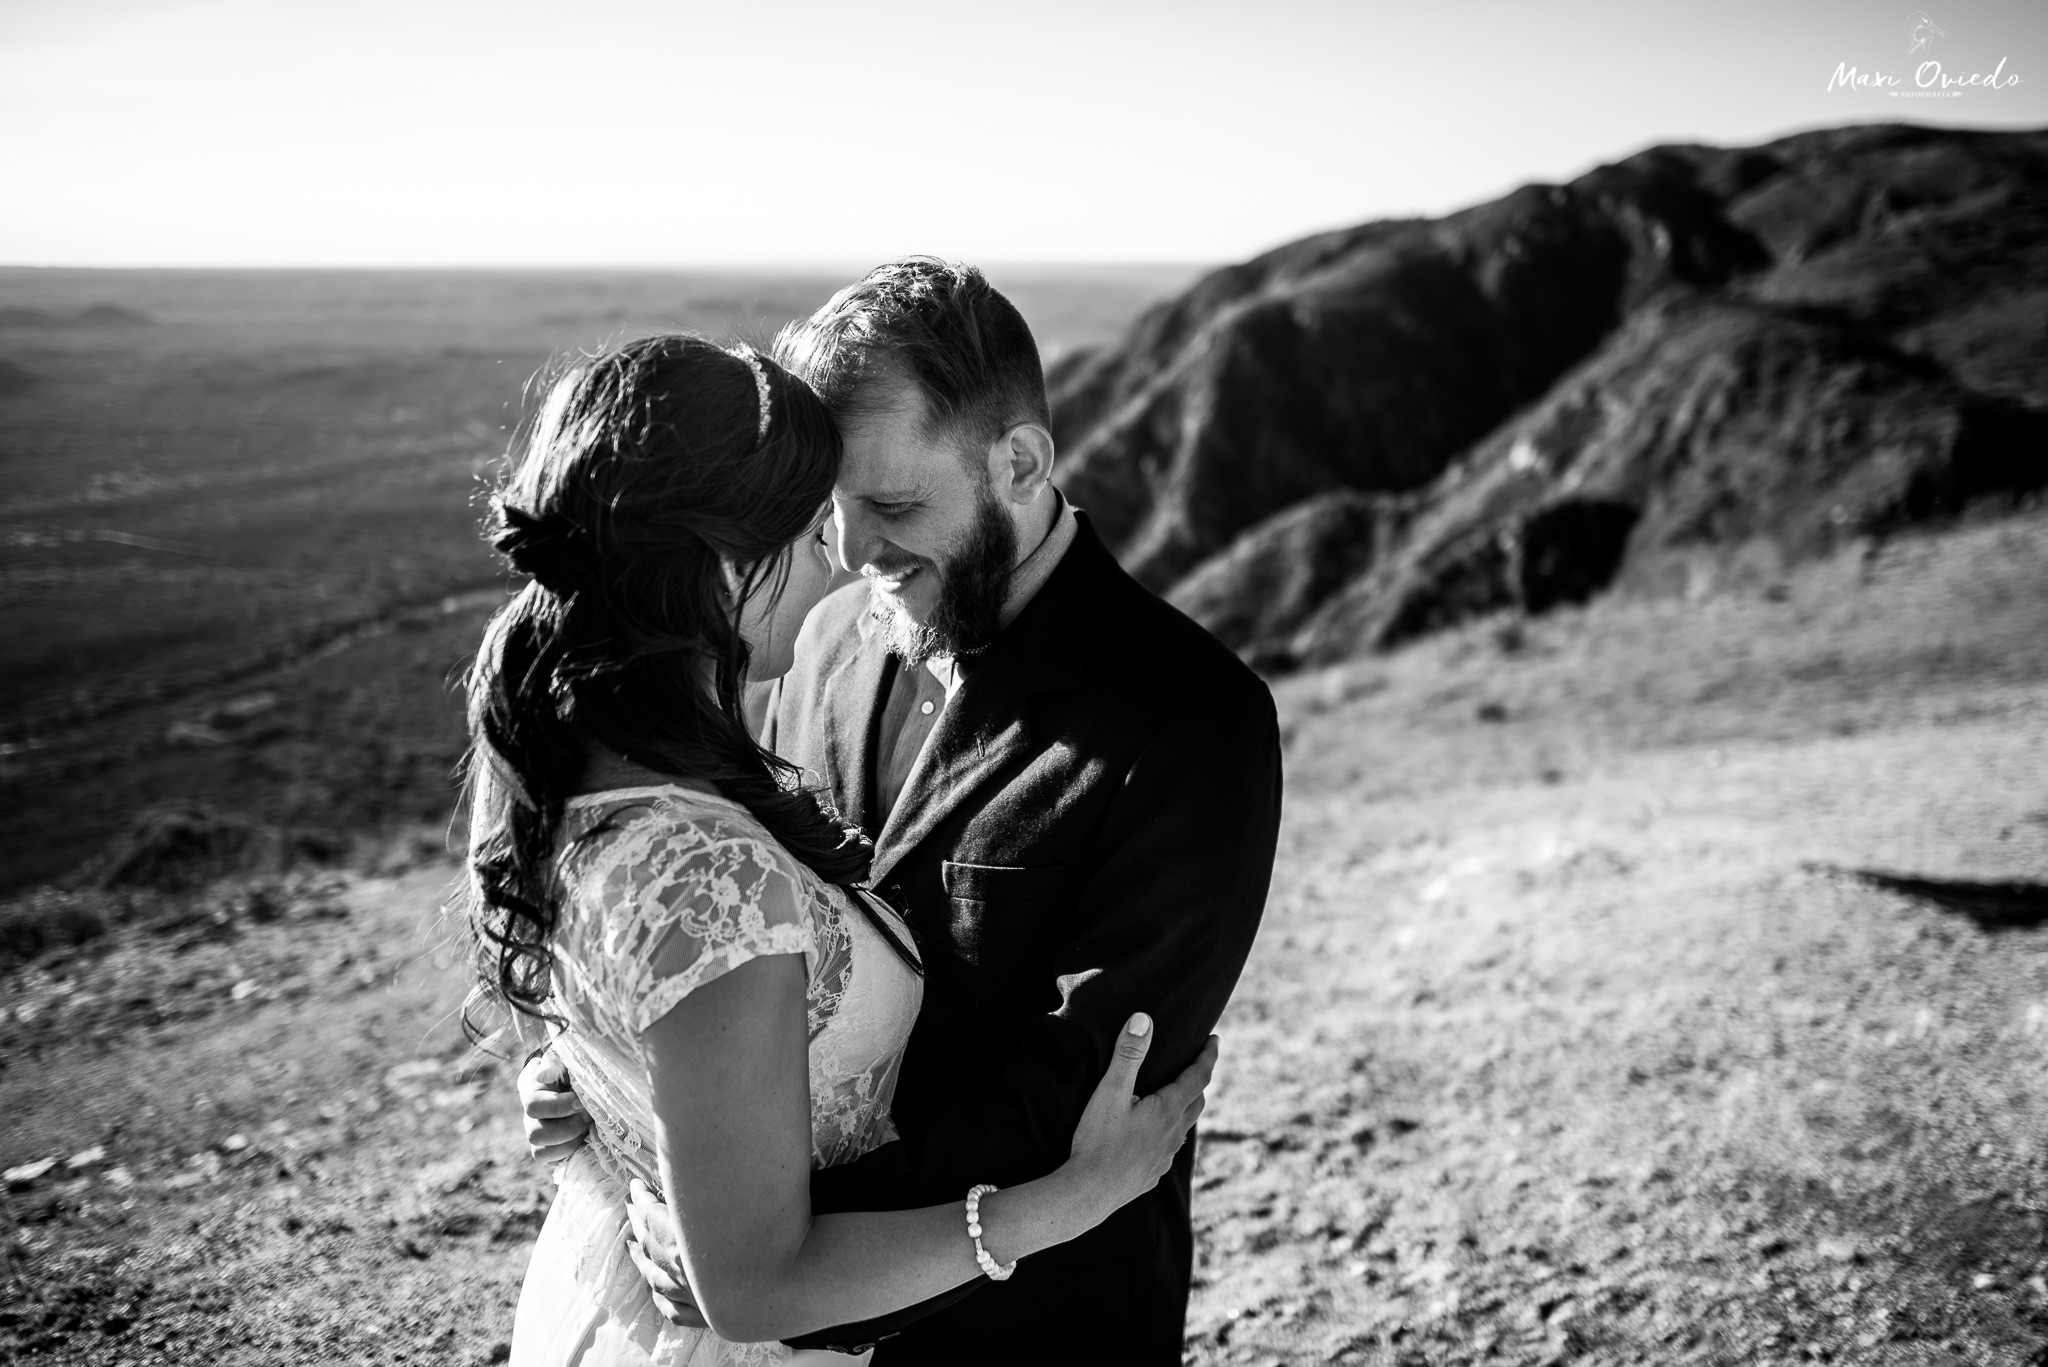 boda sextuple la cumbre cordoba cuchi corral fotografo de bodas fotografo de casamientos rosario san nicolas argentina vestido de novia ramo de novia-20.jpg